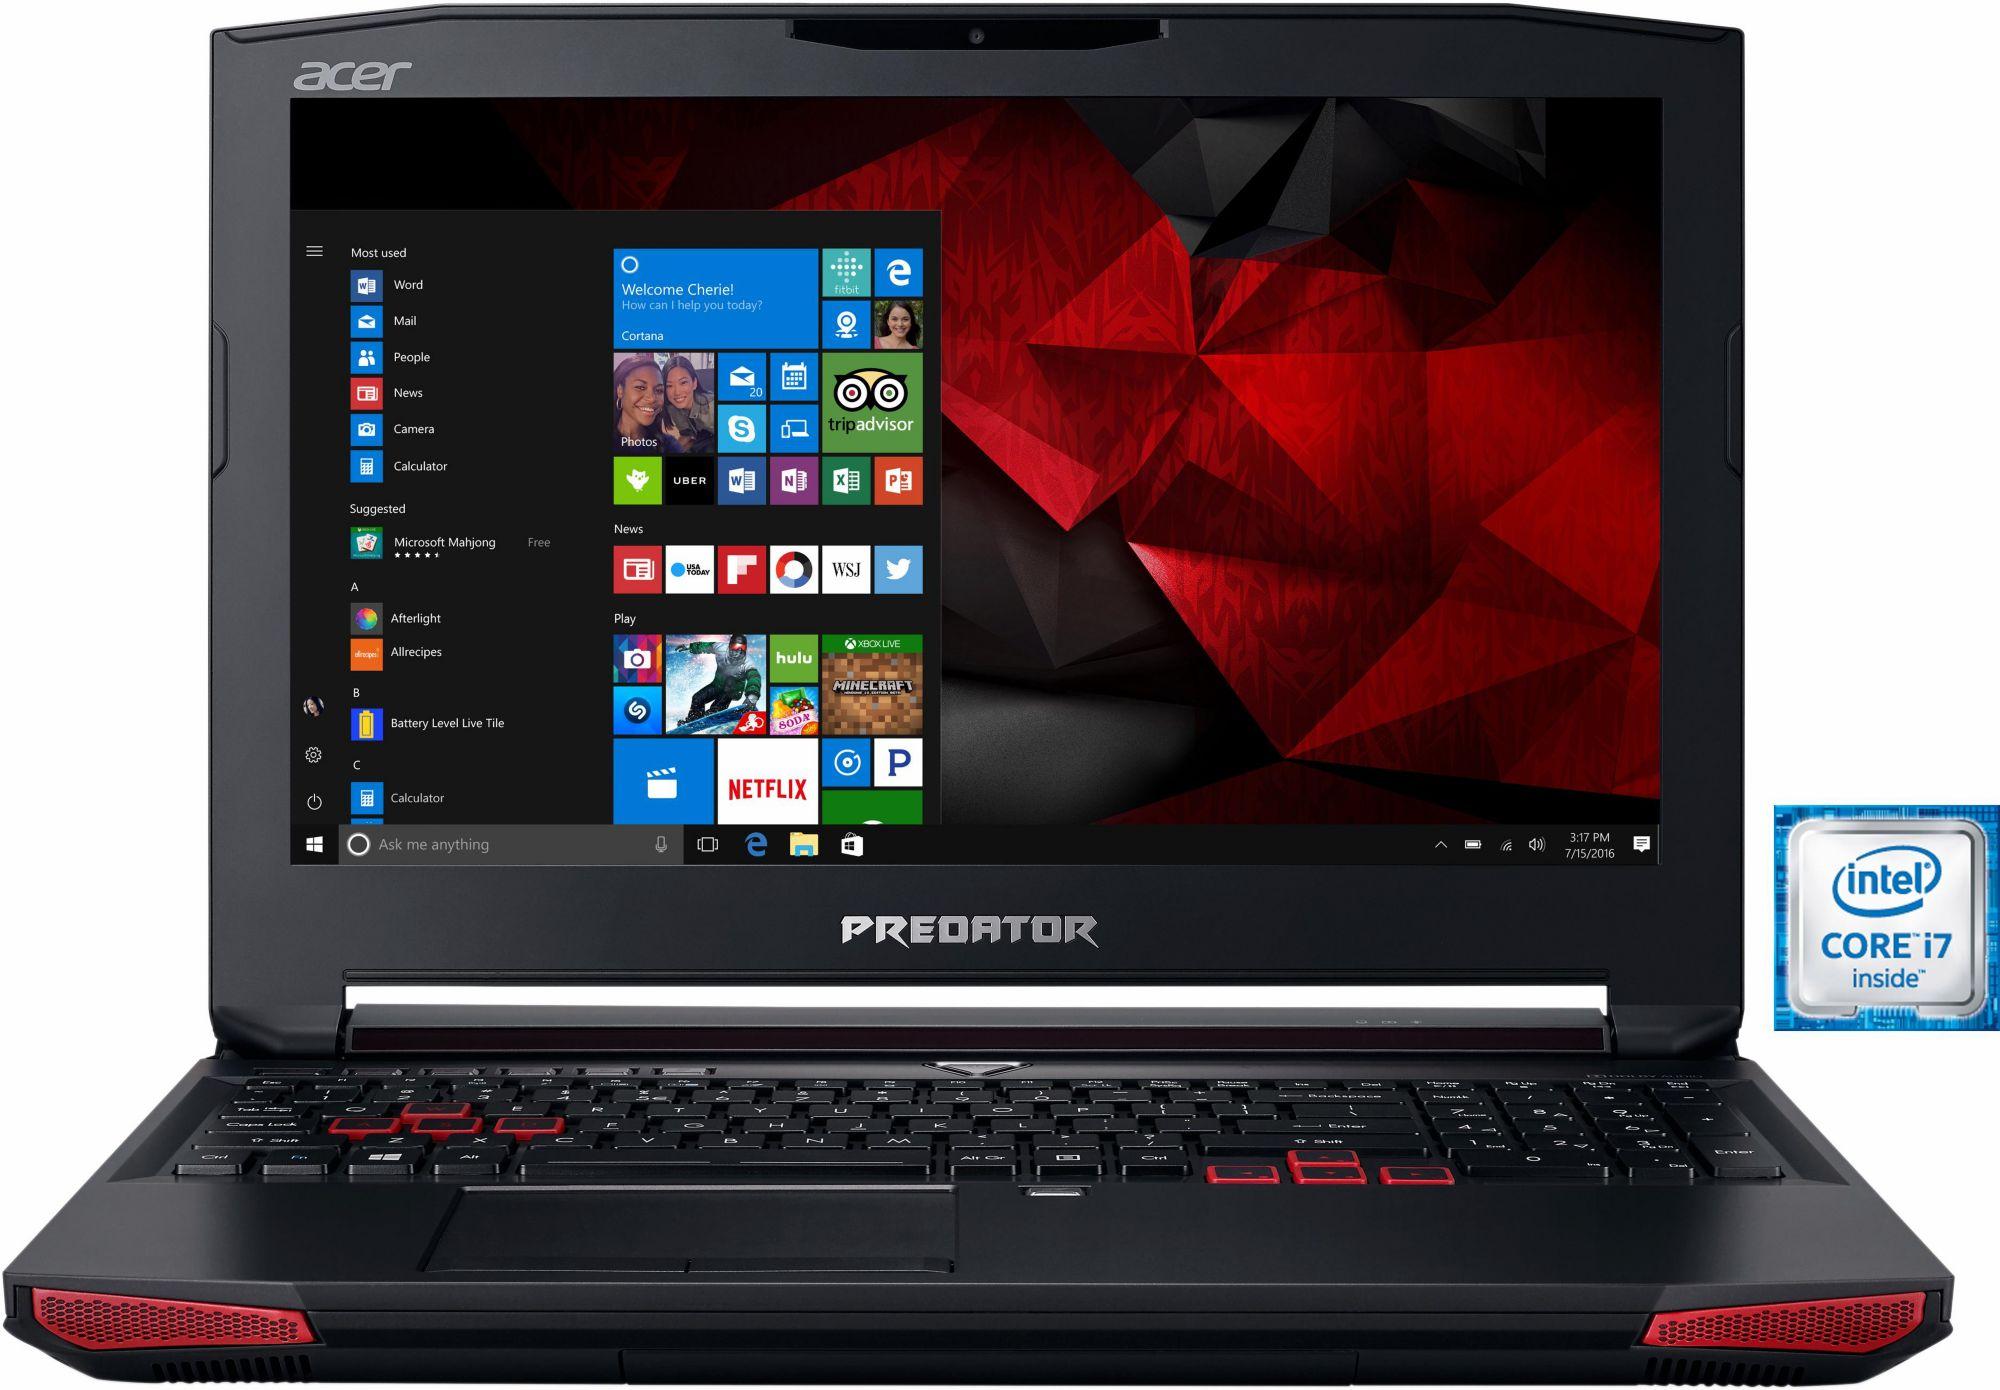 ACER Acer Predator G9-593-76D7 Notebook, Intel® Core? i7, 39,6 cm (15,6 Zoll), 1256 GB Speicher